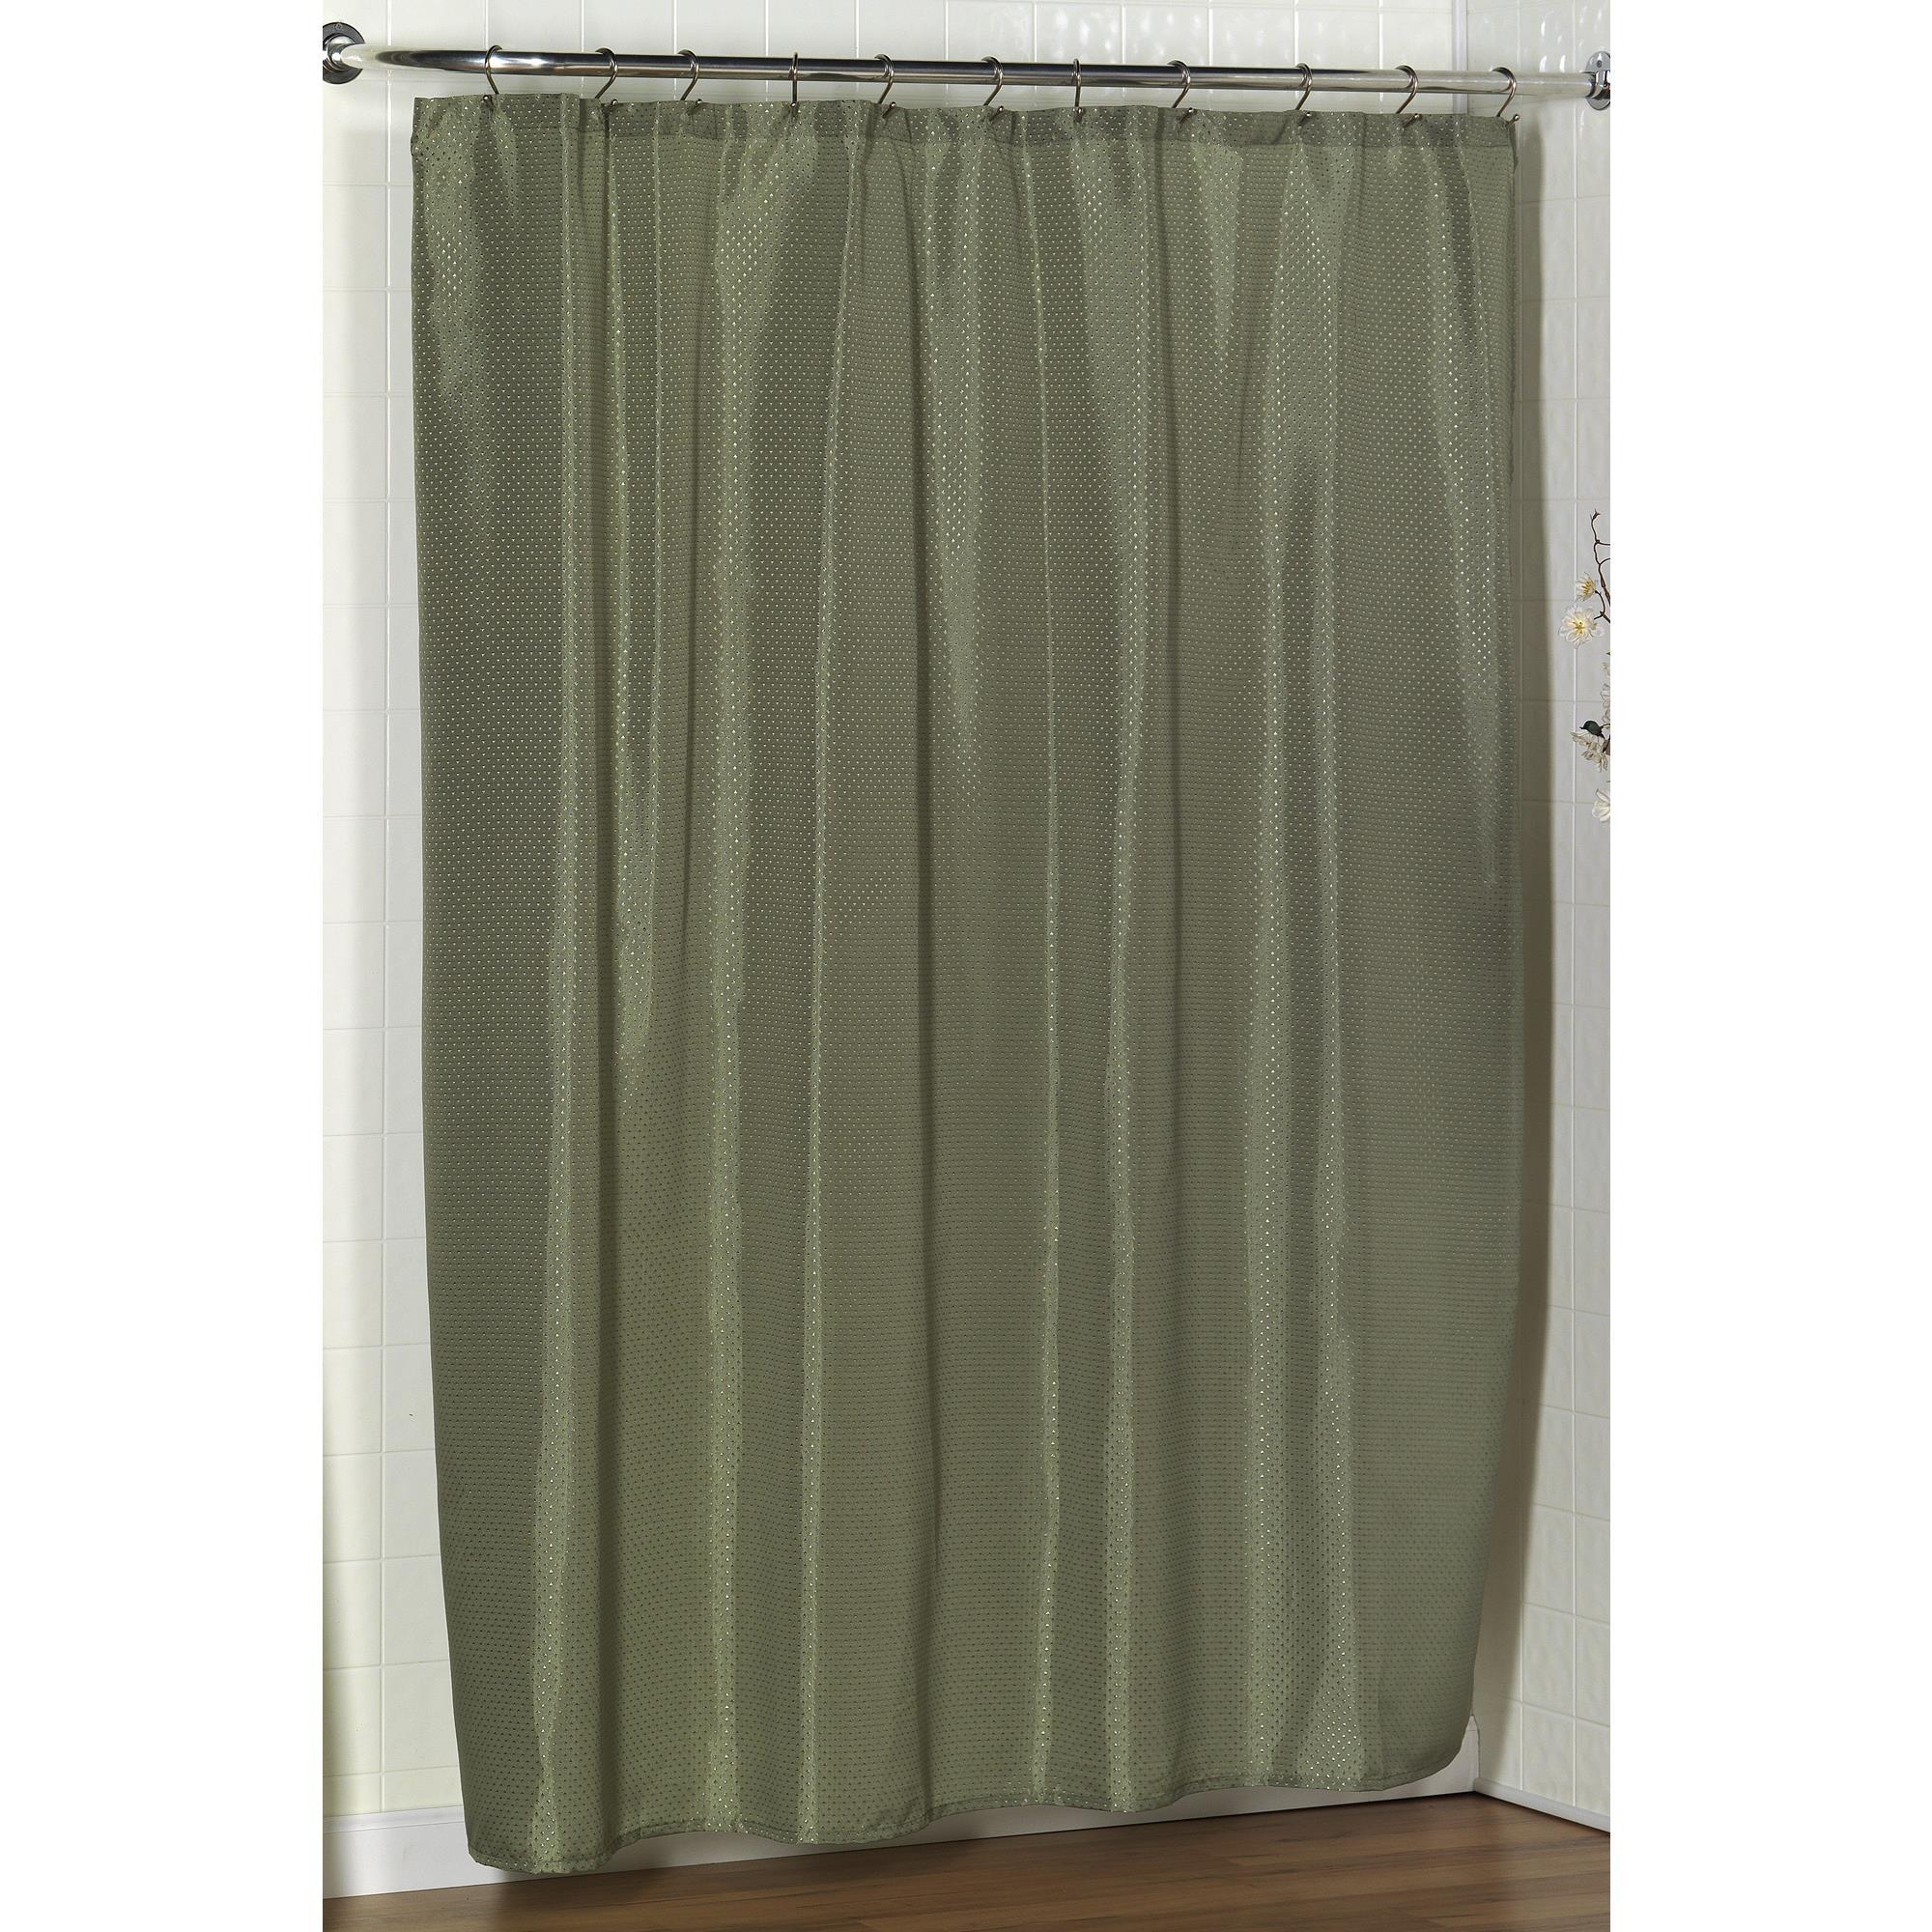 Carnation Home Lauren Dobby Fabric Shower Curtain In Sage